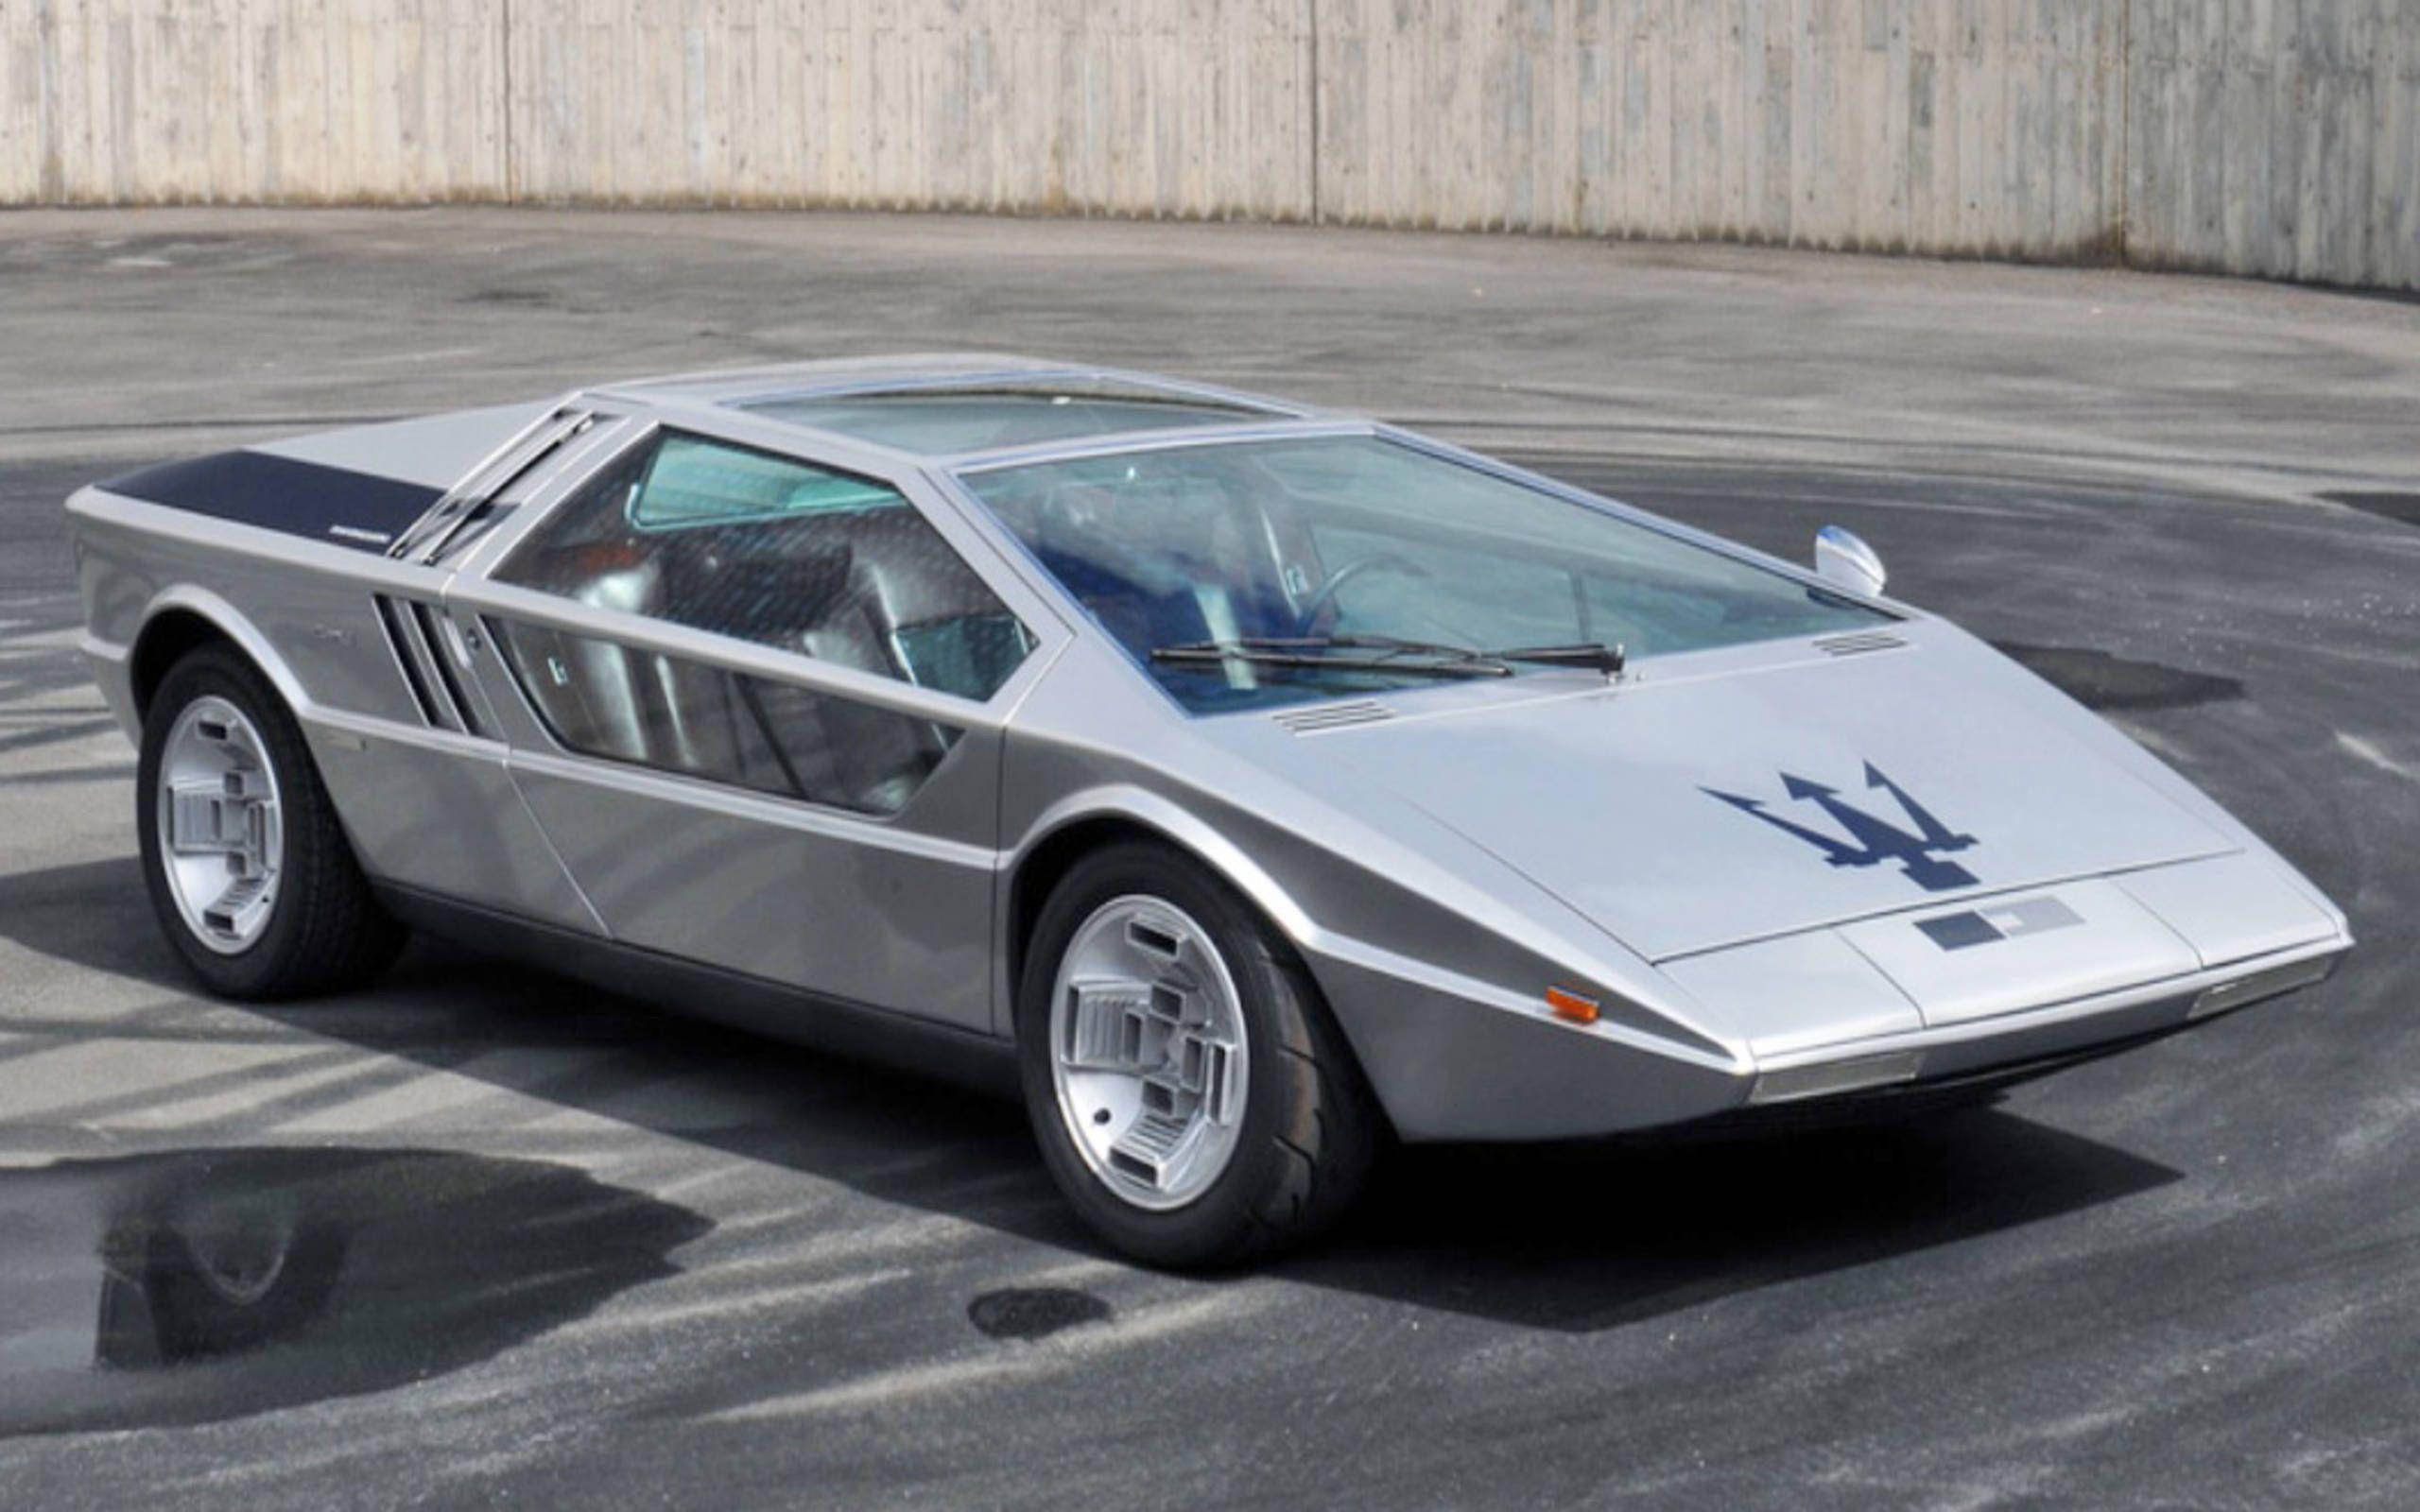 The 1971 Maserati Boomerang